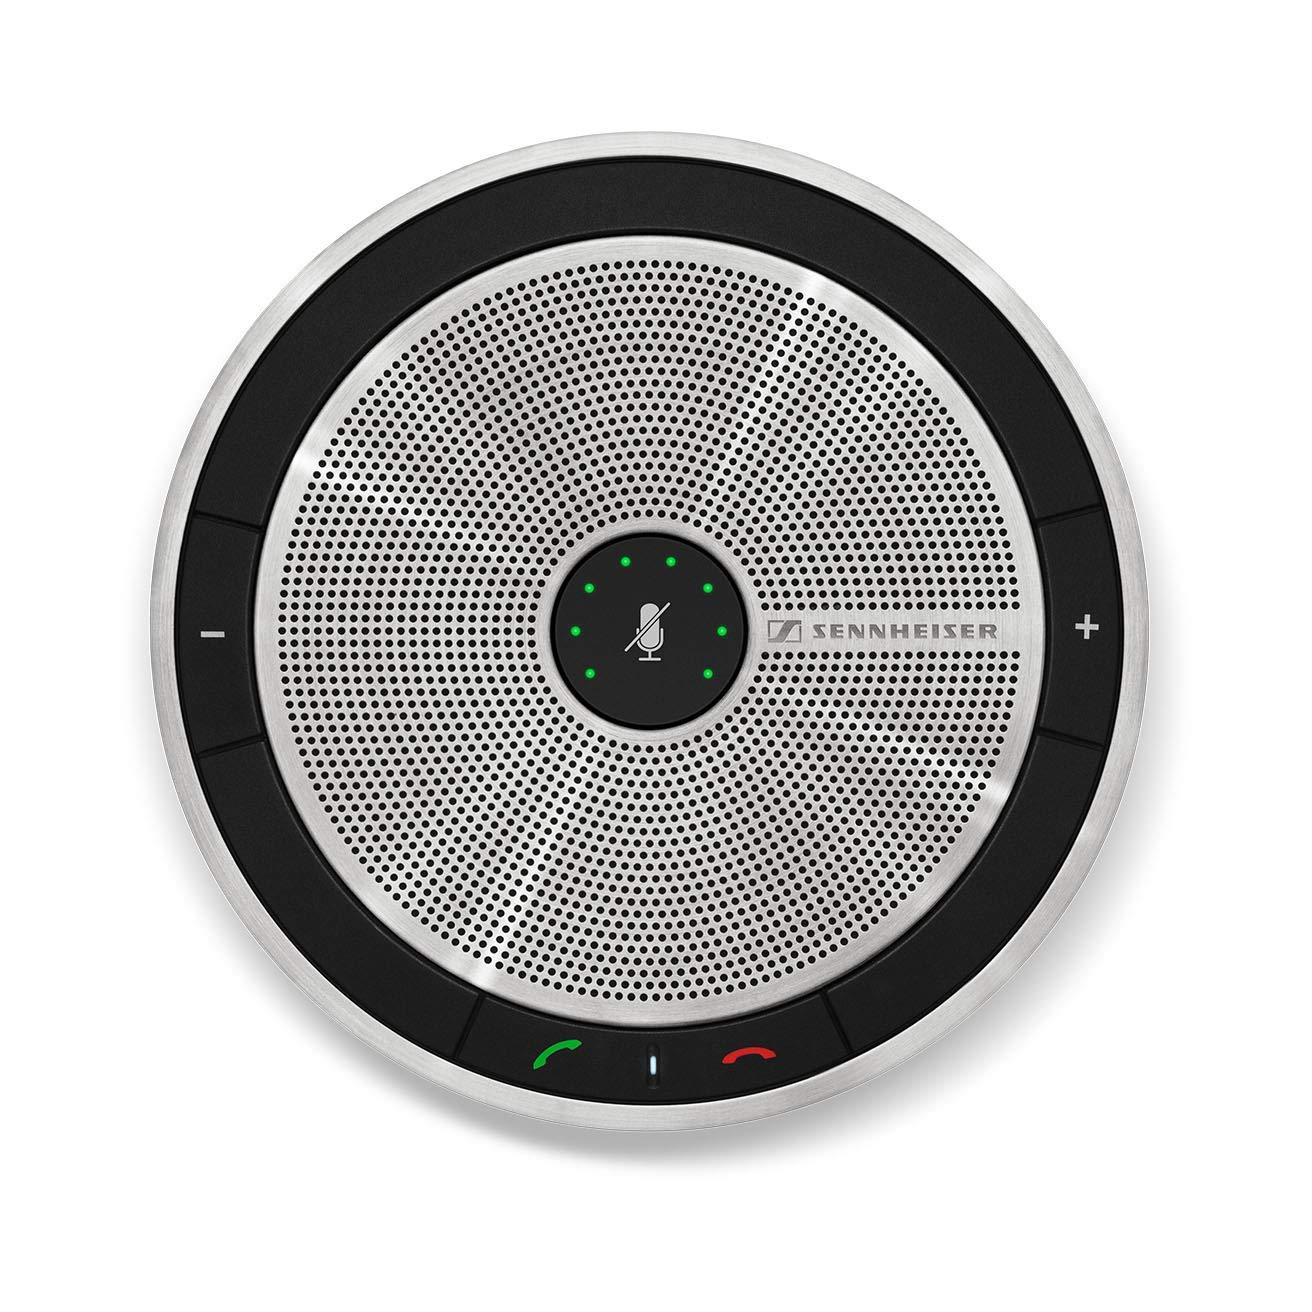 Sennheiser 506049 Sound Enhanced User Friendly Connection